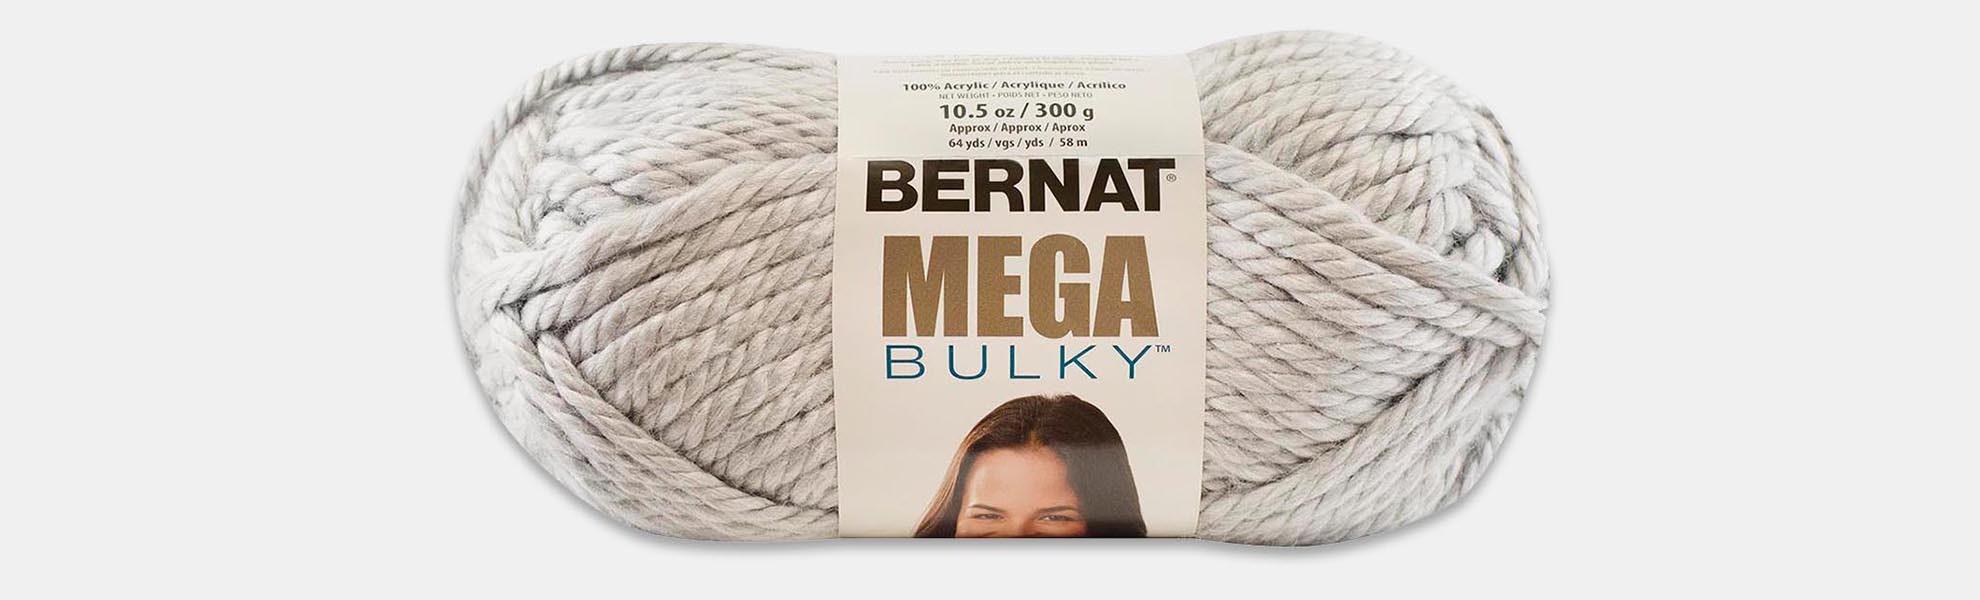 Bernat Mega Bulky Yarn (4-Pack)